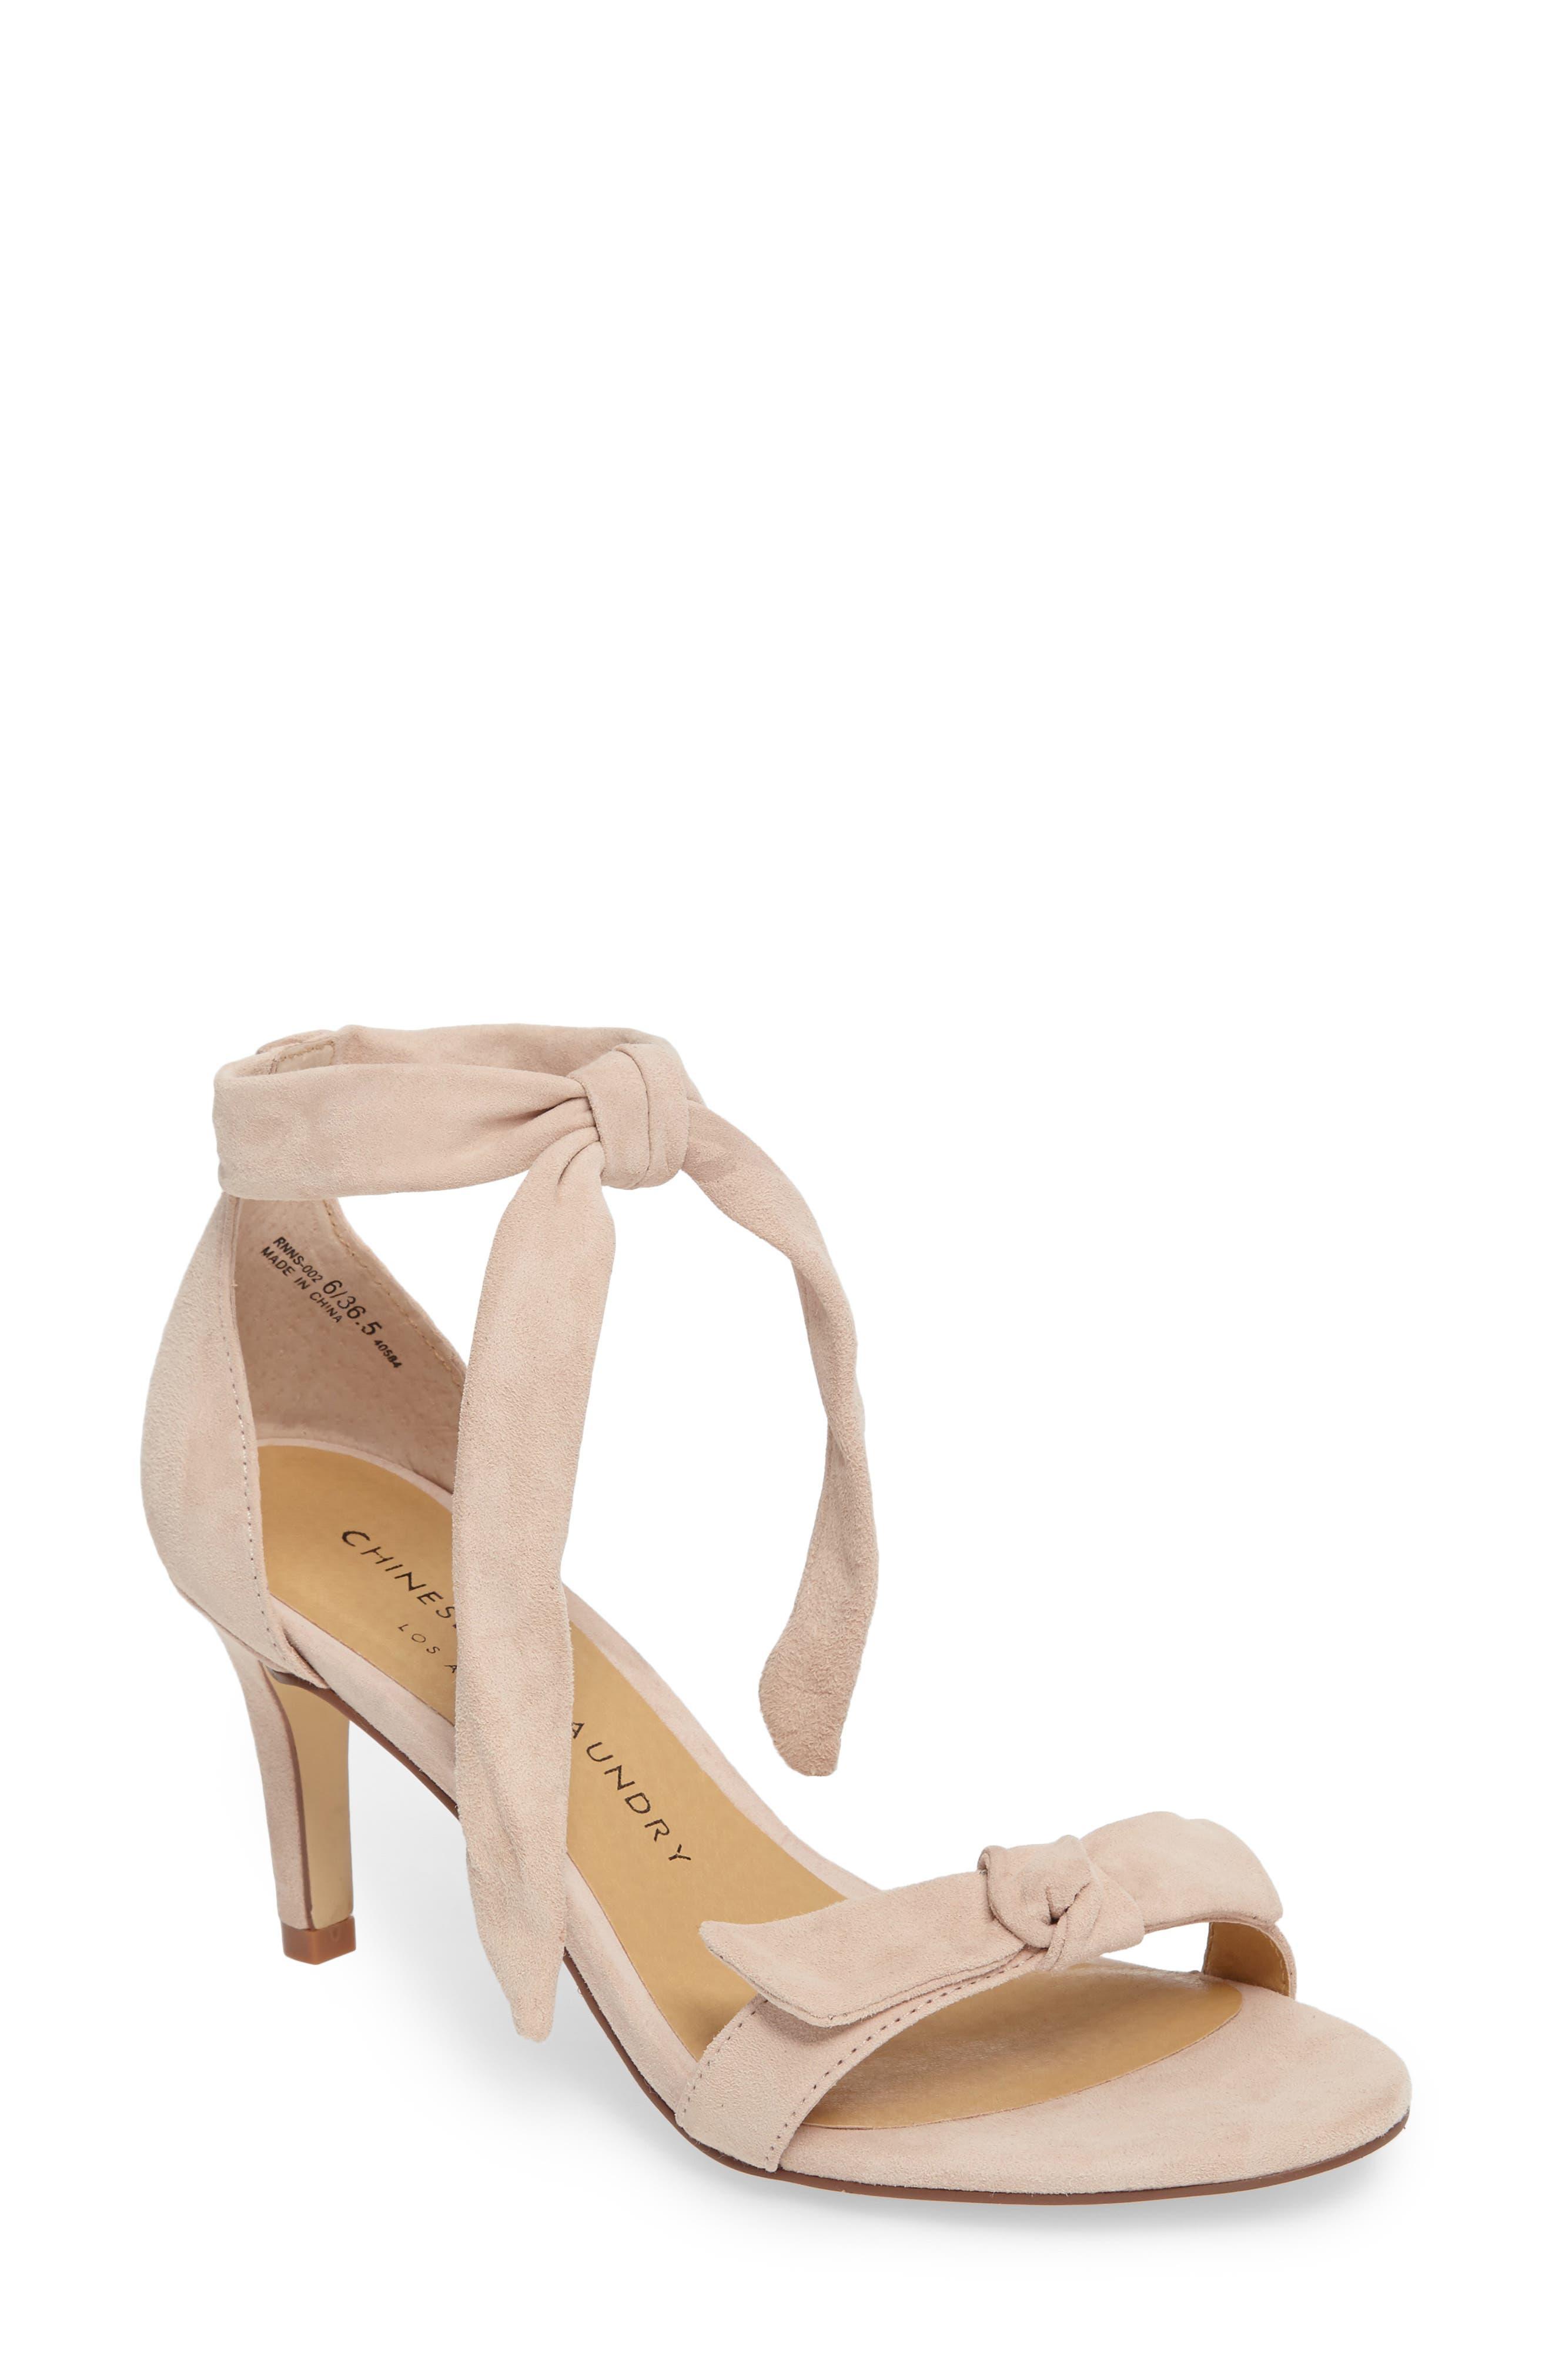 Alternate Image 1 Selected - Chinese Laundry Rhonda Ankle Tie Sandal (Women)